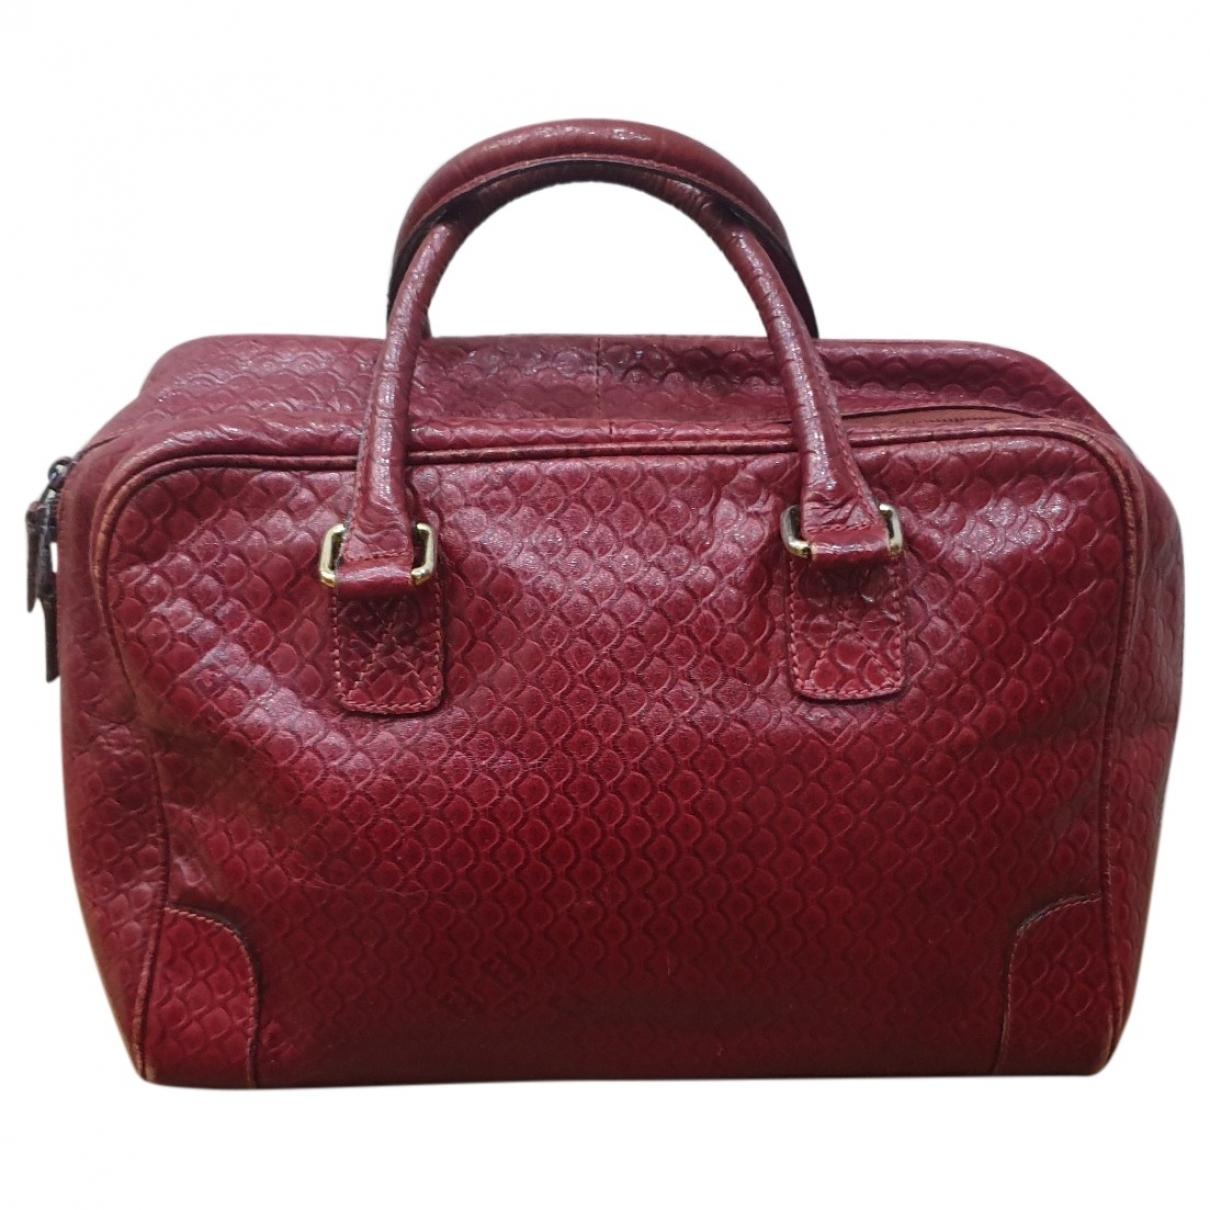 Fendi \N Handtasche in  Bordeauxrot Leder